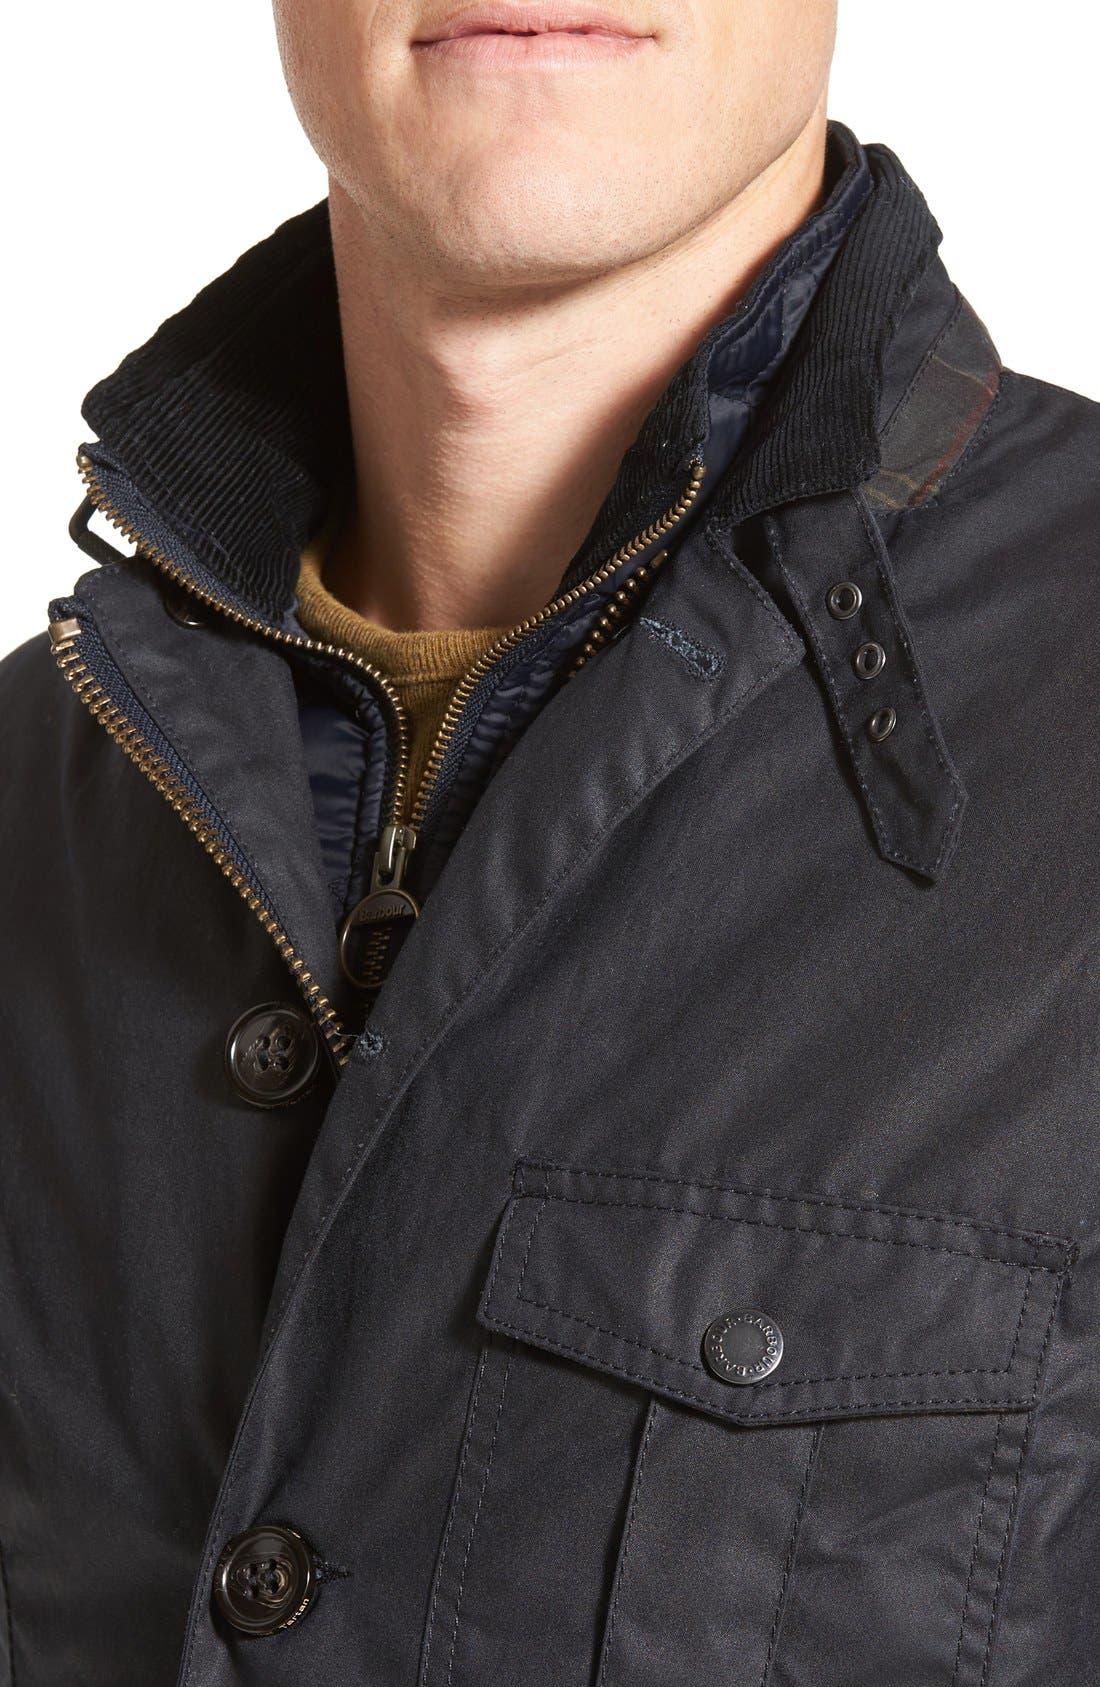 Torridon Wax Jacket with Bib,                             Alternate thumbnail 4, color,                             410